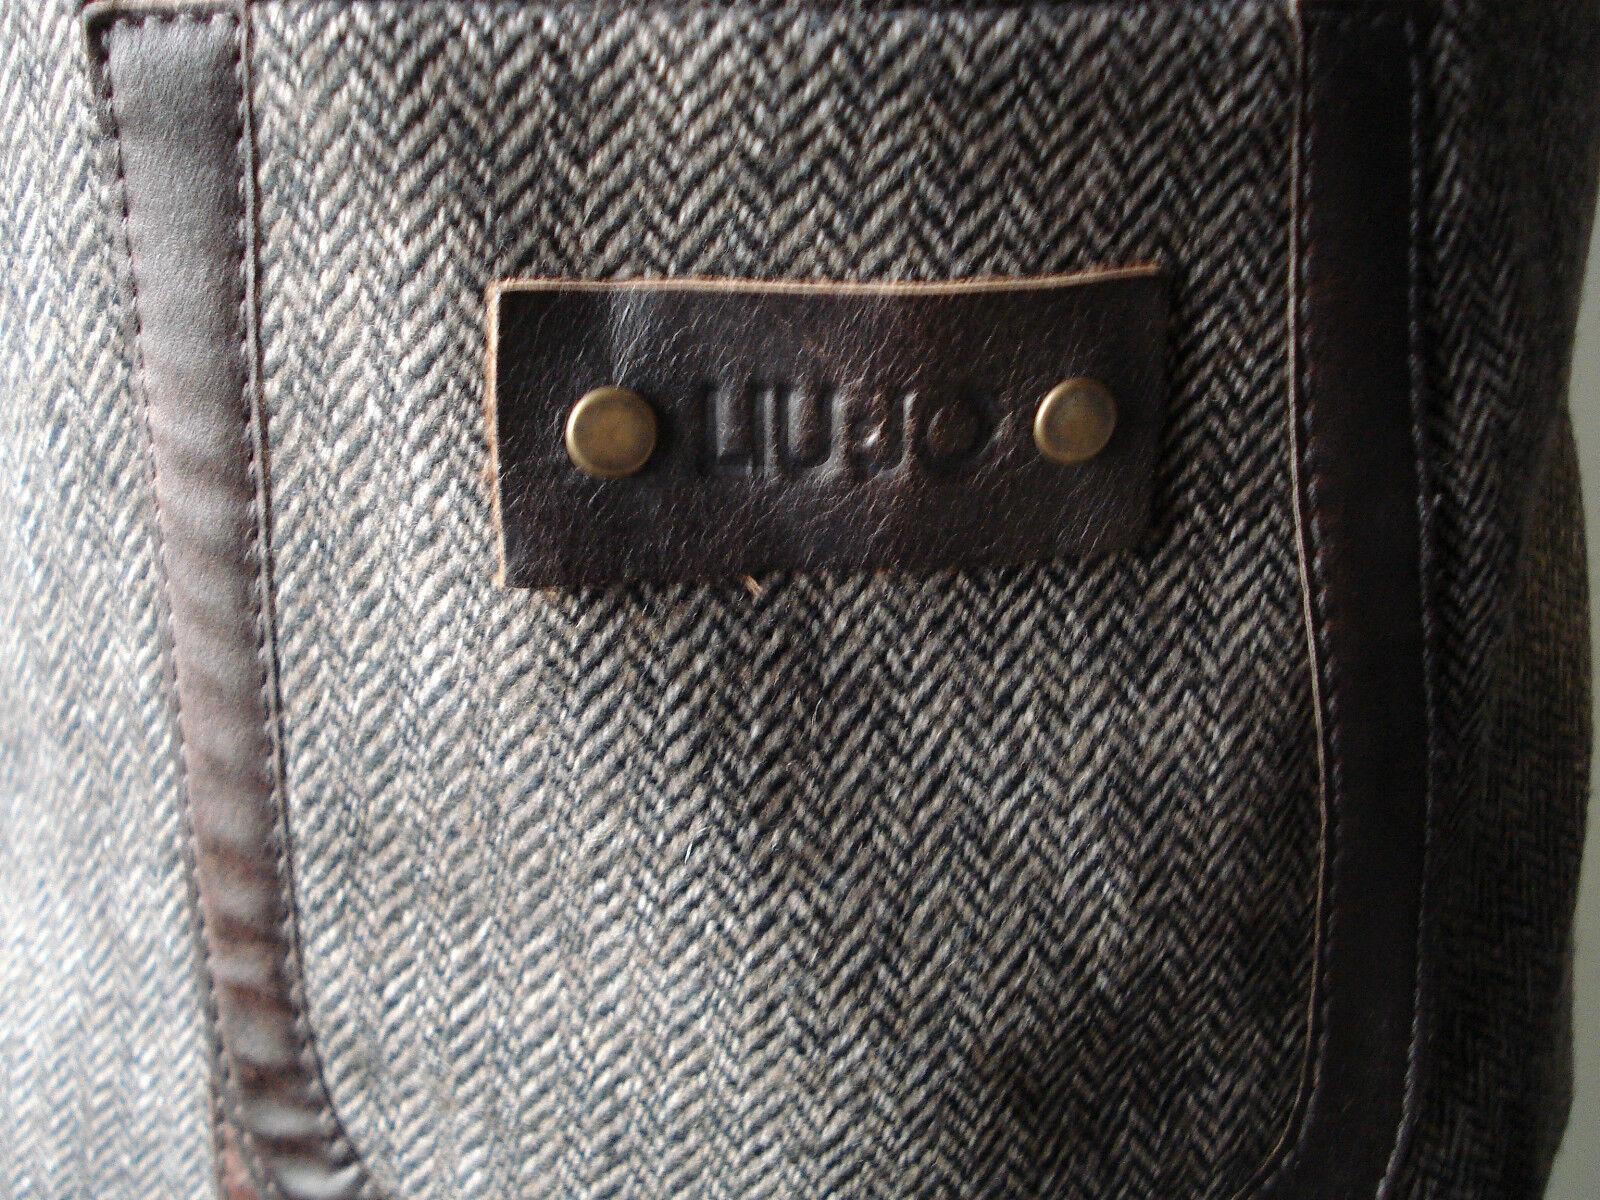 Liu.Jo Damen Damen Damen Köstume Anzug Hose Blazer Braun 38 40 M L | Online-Shop  | Elegantes und robustes Menü  | Wunderbar  faab86